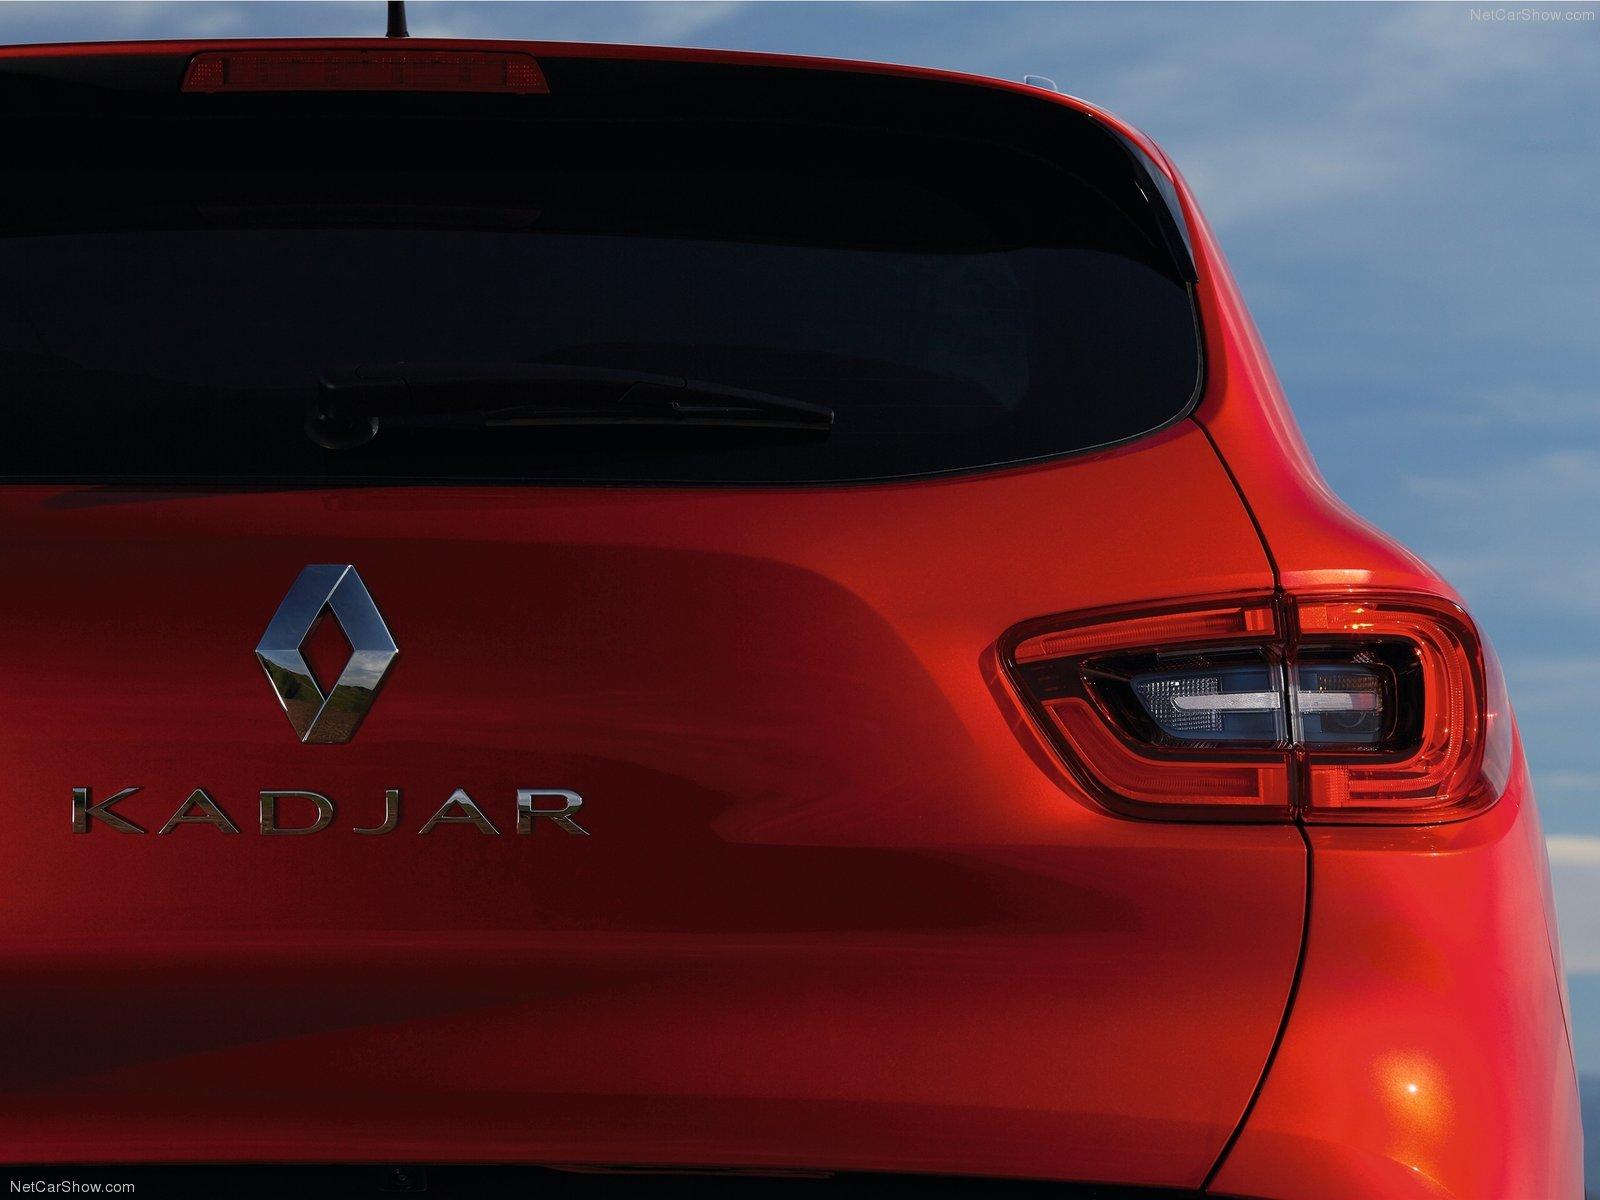 Renault-Kadjar_2016_1600x1200_wallpaper_5e